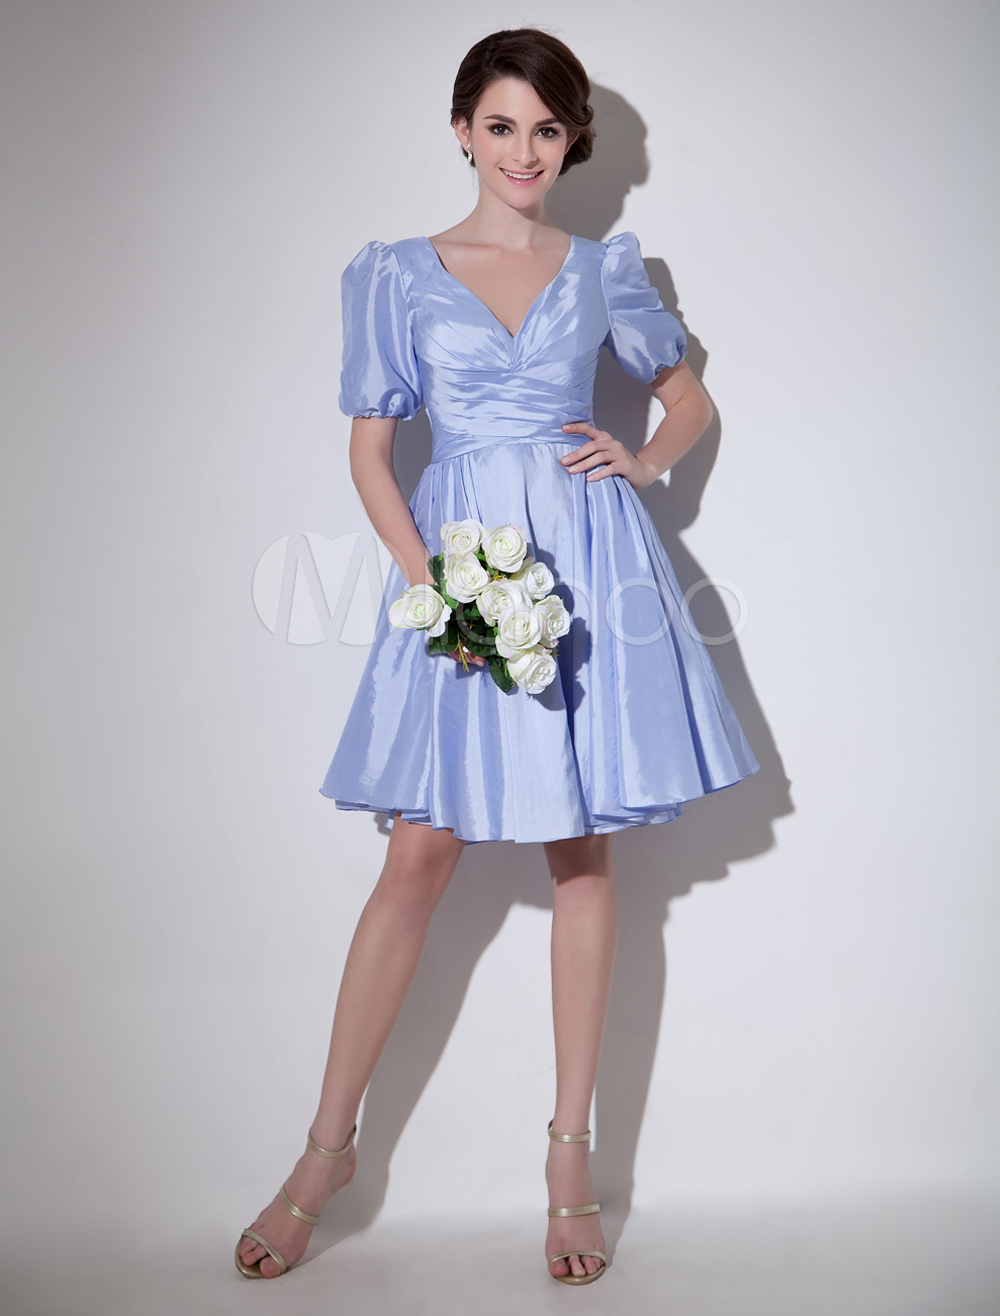 2bd596b2d2c ... Violet Cocktail Dress Taffeta A Line Prom Dress V Neck Short Sleeves  Pleated Party Dress Milanoo. 12. 32%OFF. Color Violet